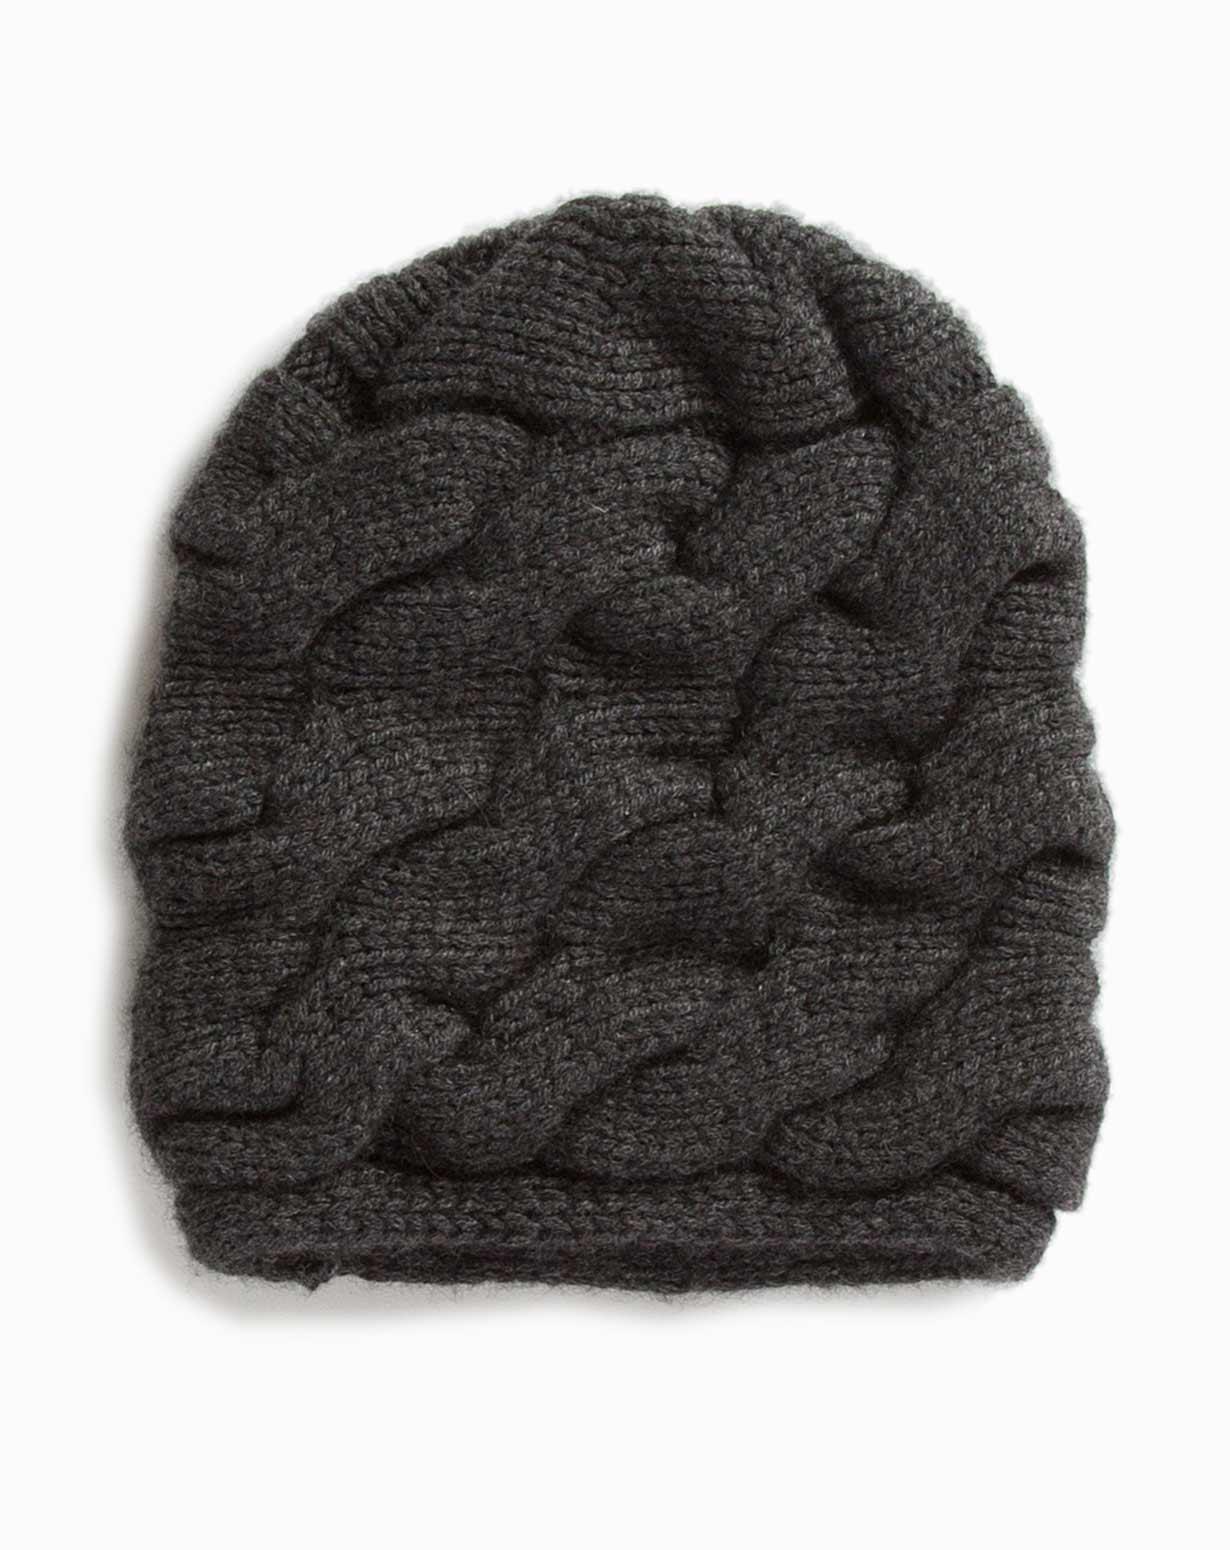 Women s Chunky Braided Cable Knit Beanie  13efa3d51b3